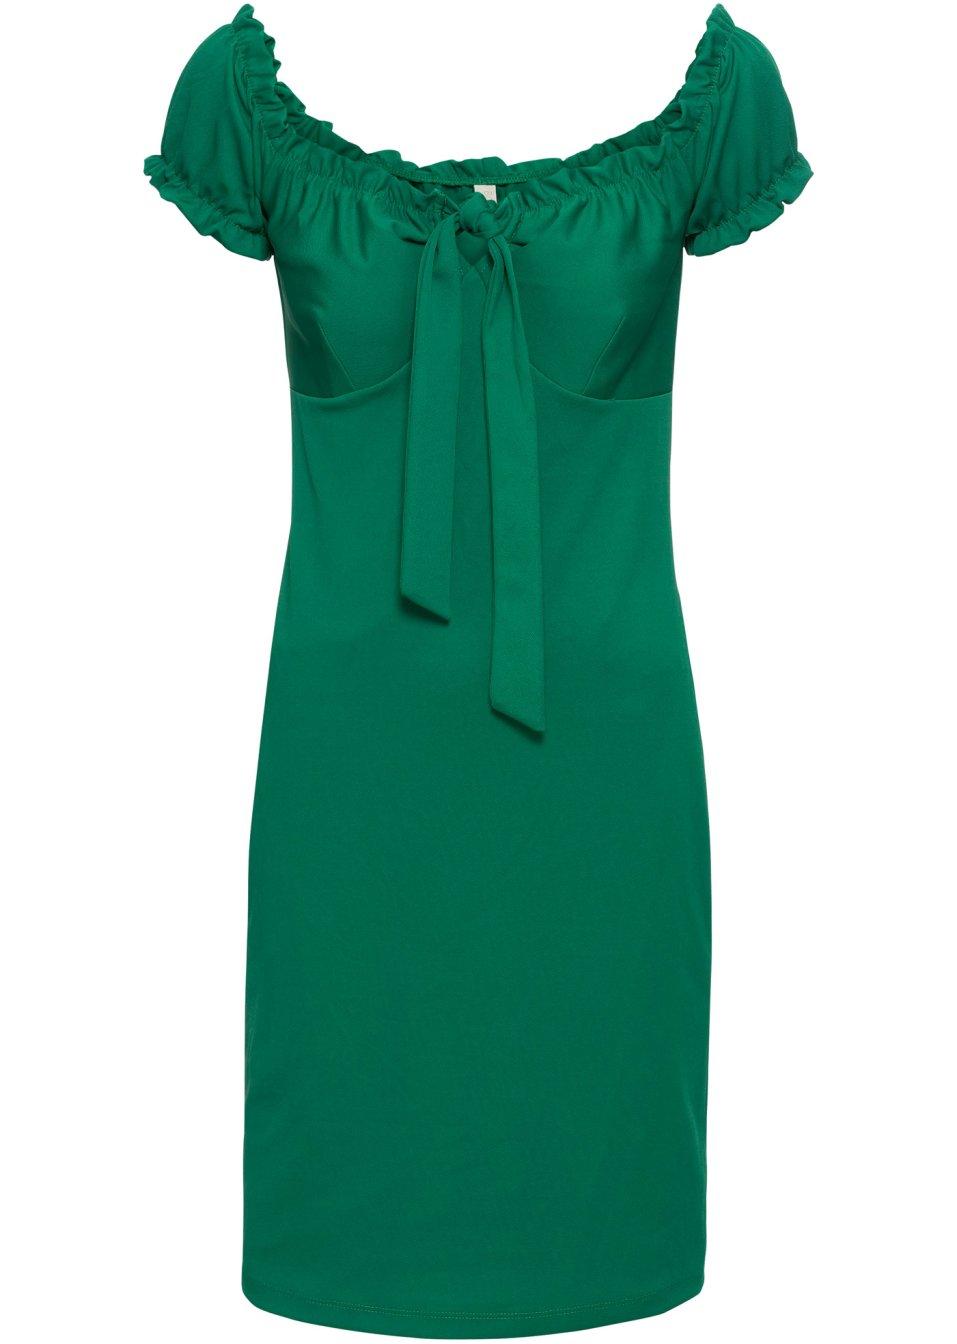 Ausdrucksstarkes Kleid mit tiefem Dekolleté - grün t3aoq iNz96